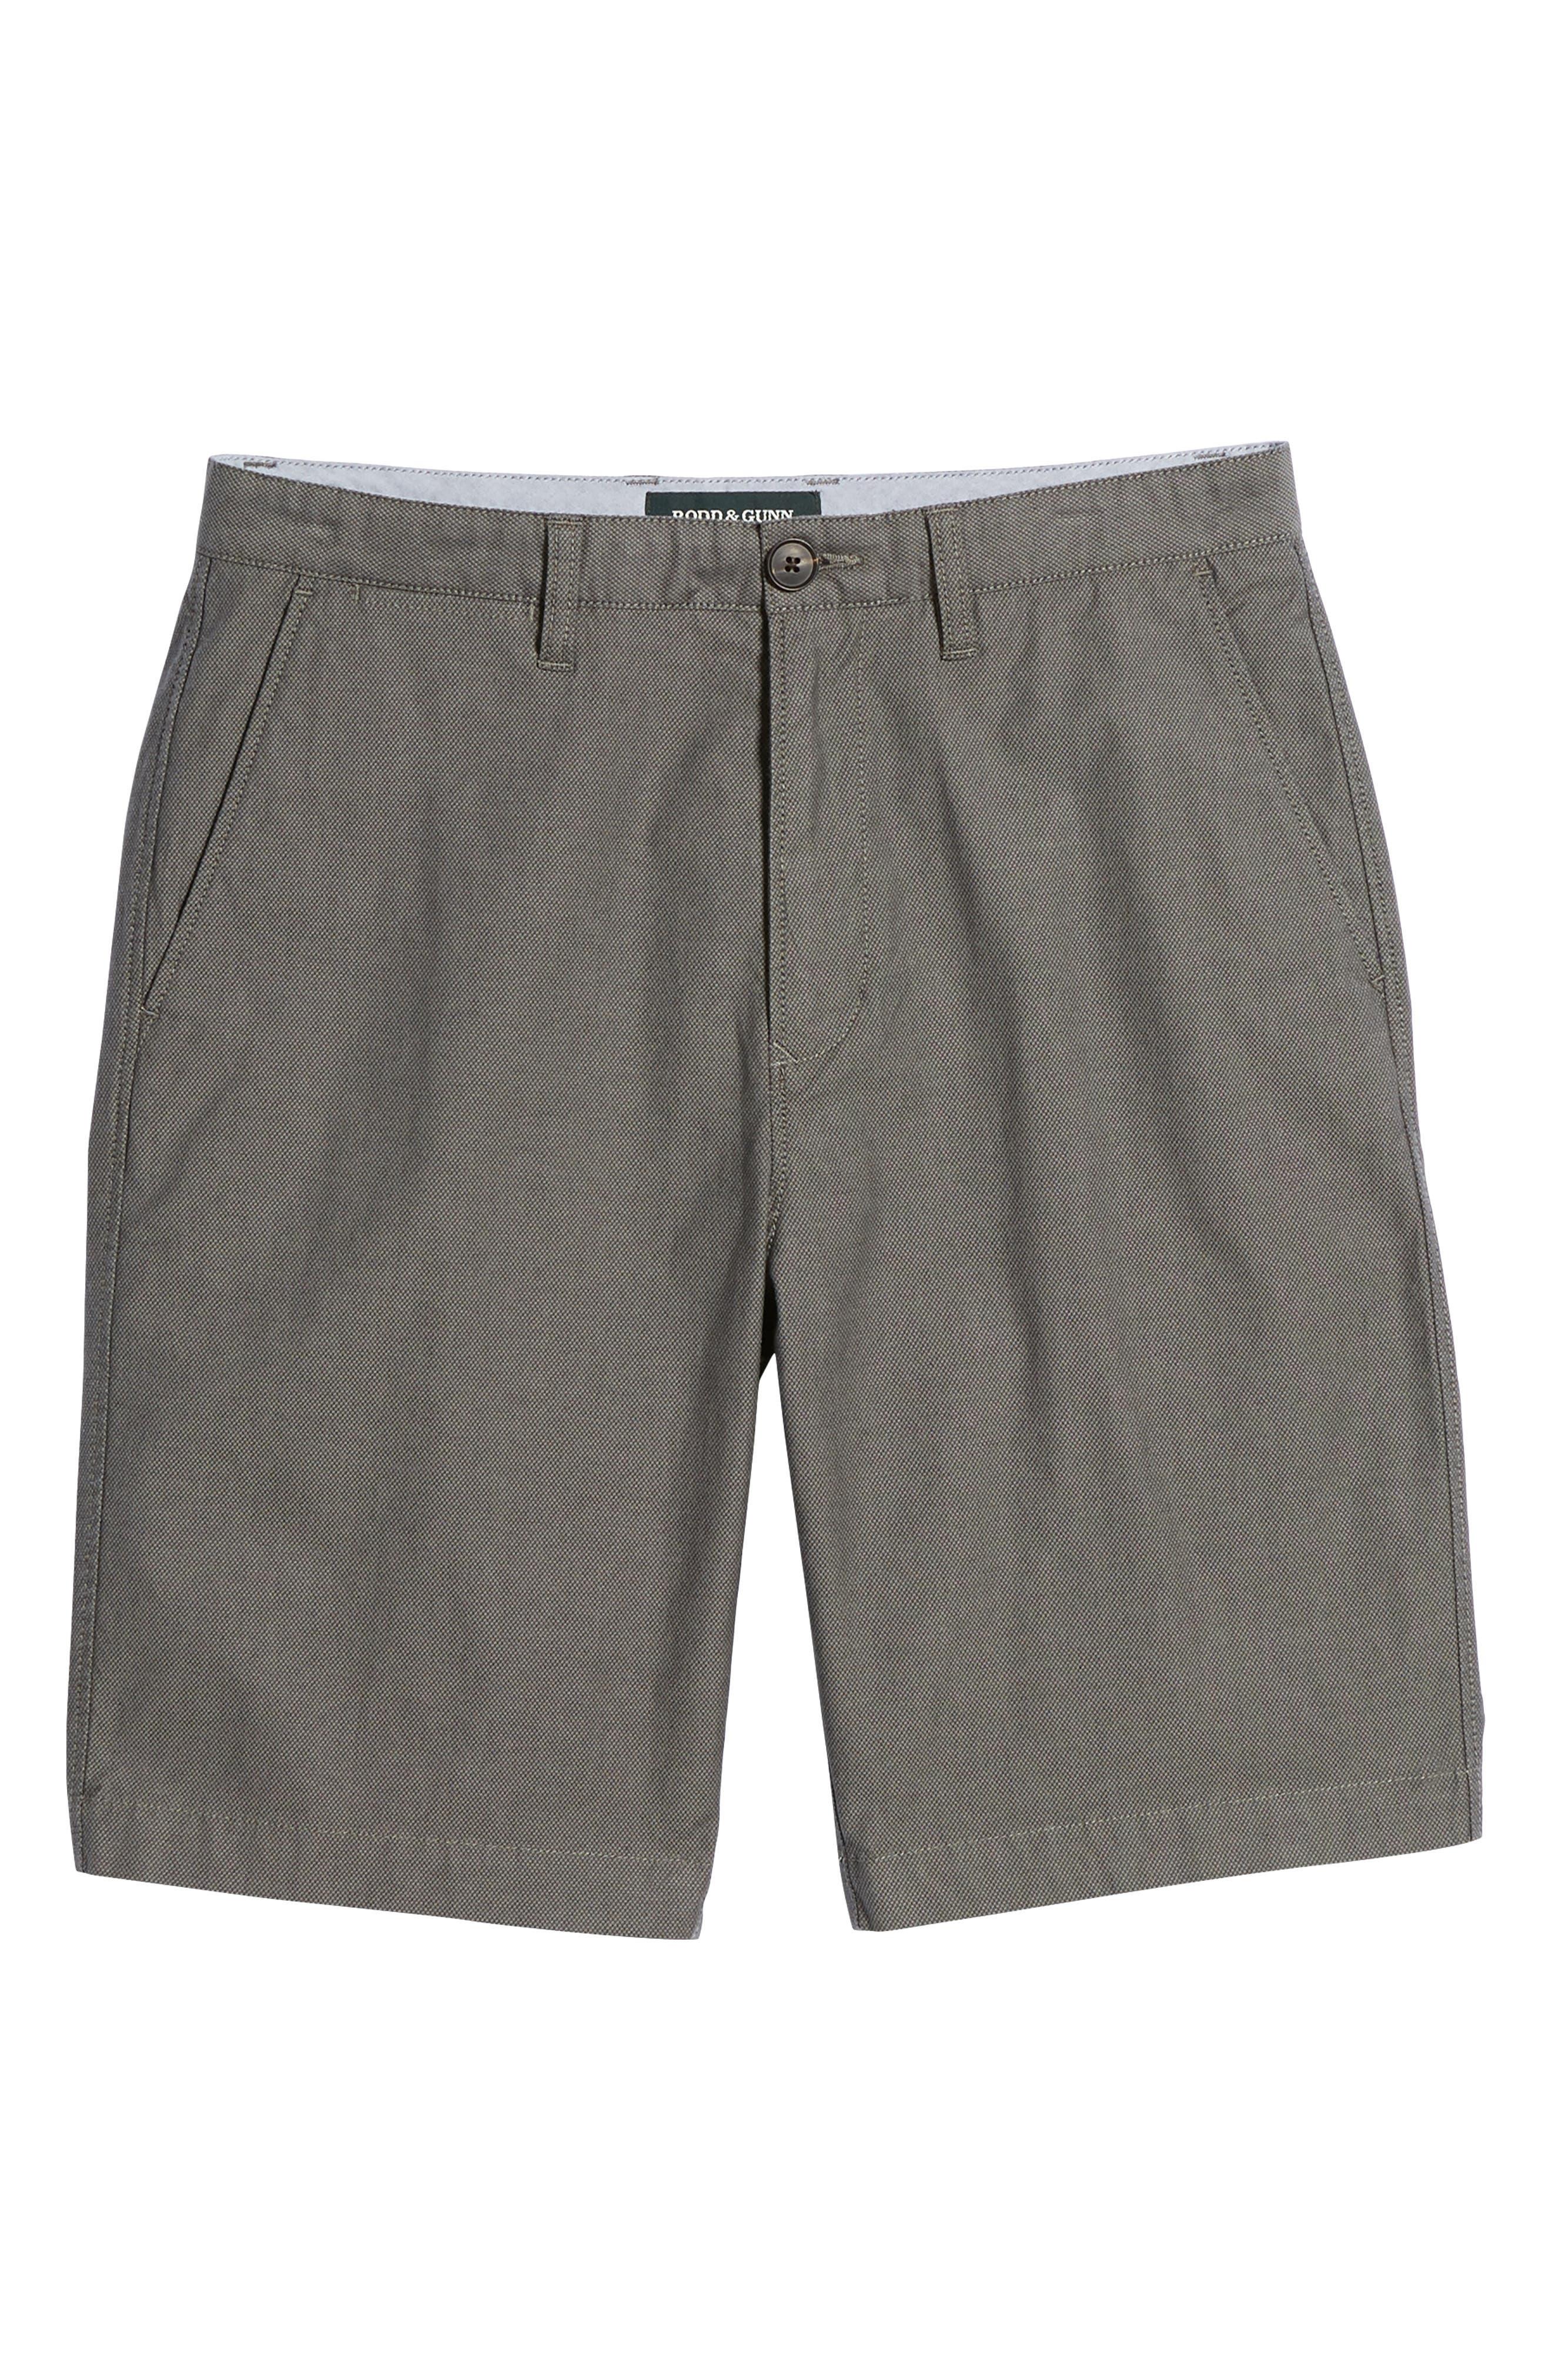 RODD & GUNN,                             Army Bay Regular Fit Shorts,                             Alternate thumbnail 6, color,                             023